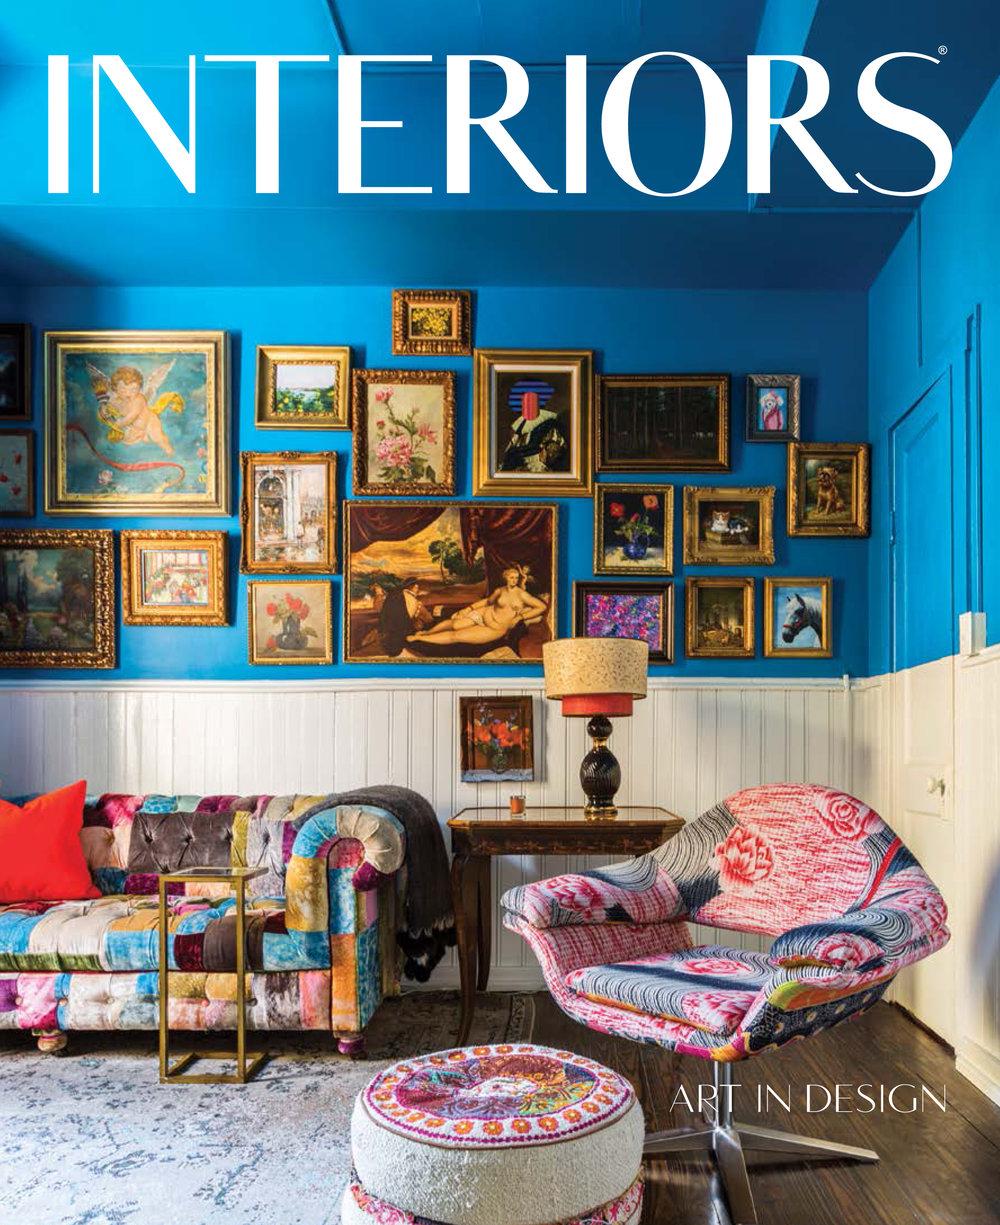 Interiors+Sept+Oct+DOMANI-1.jpg